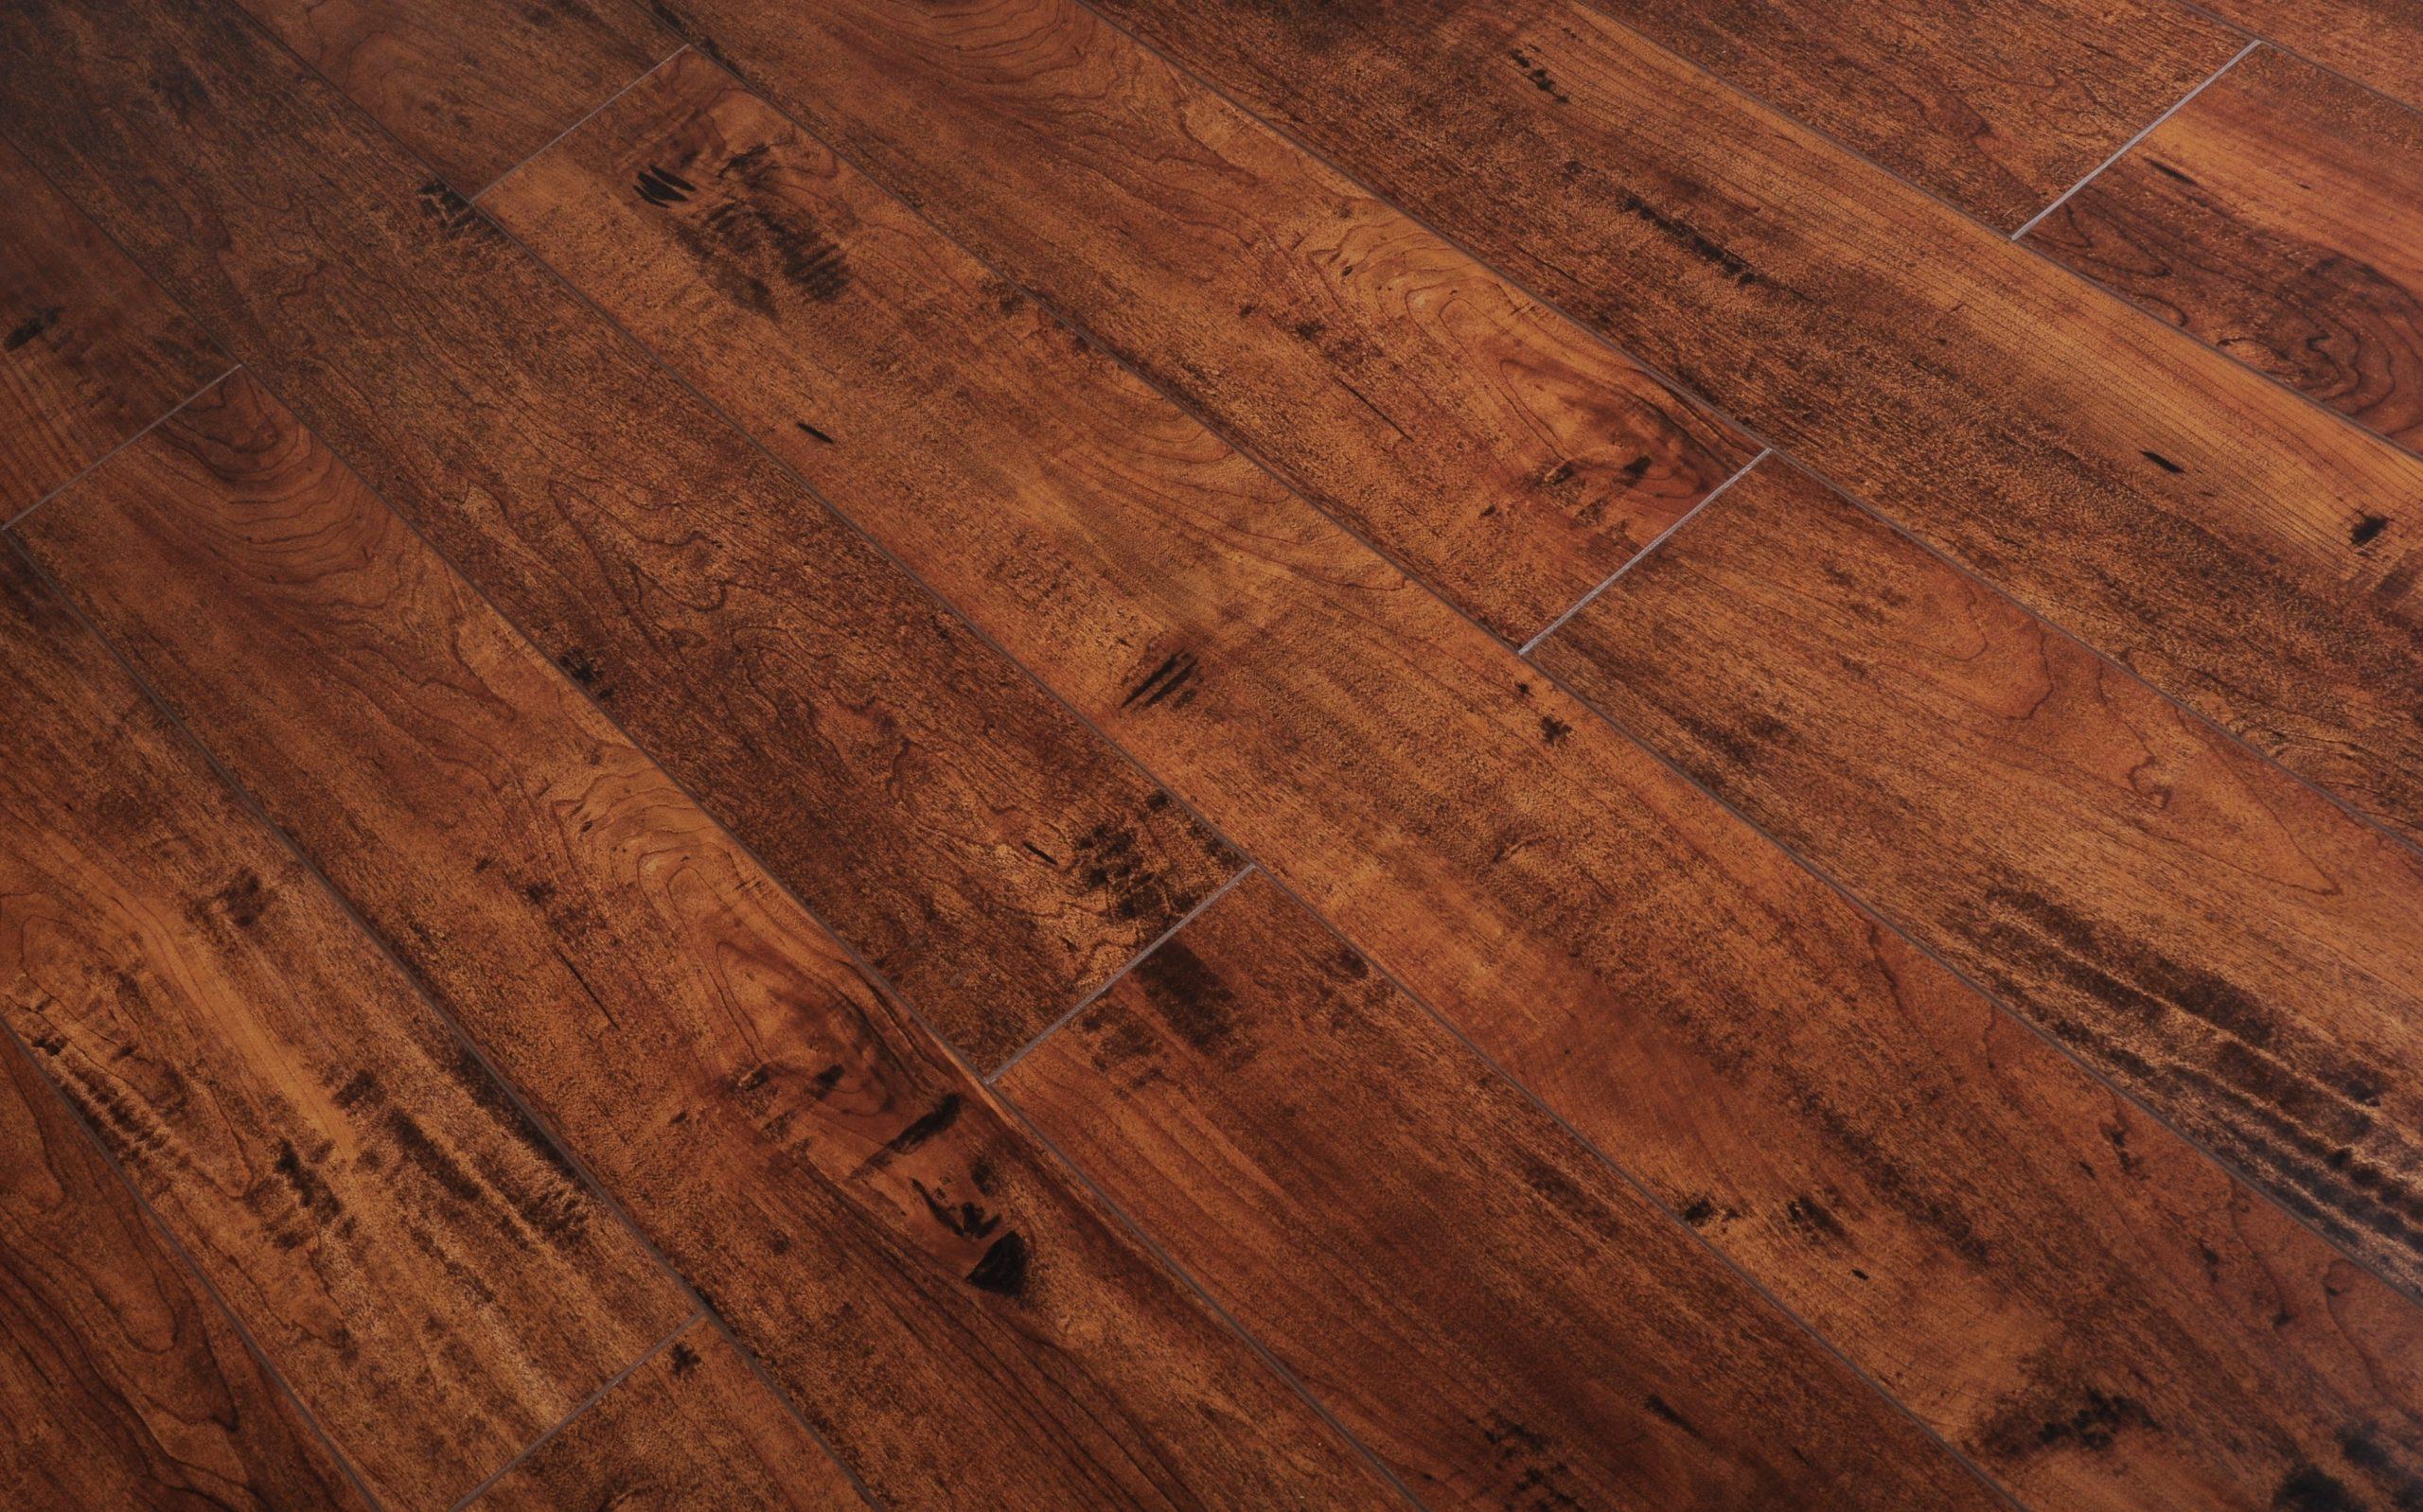 Toucan Laminate Flooring 5 Inch Wide, 5 Inch Laminate Flooring